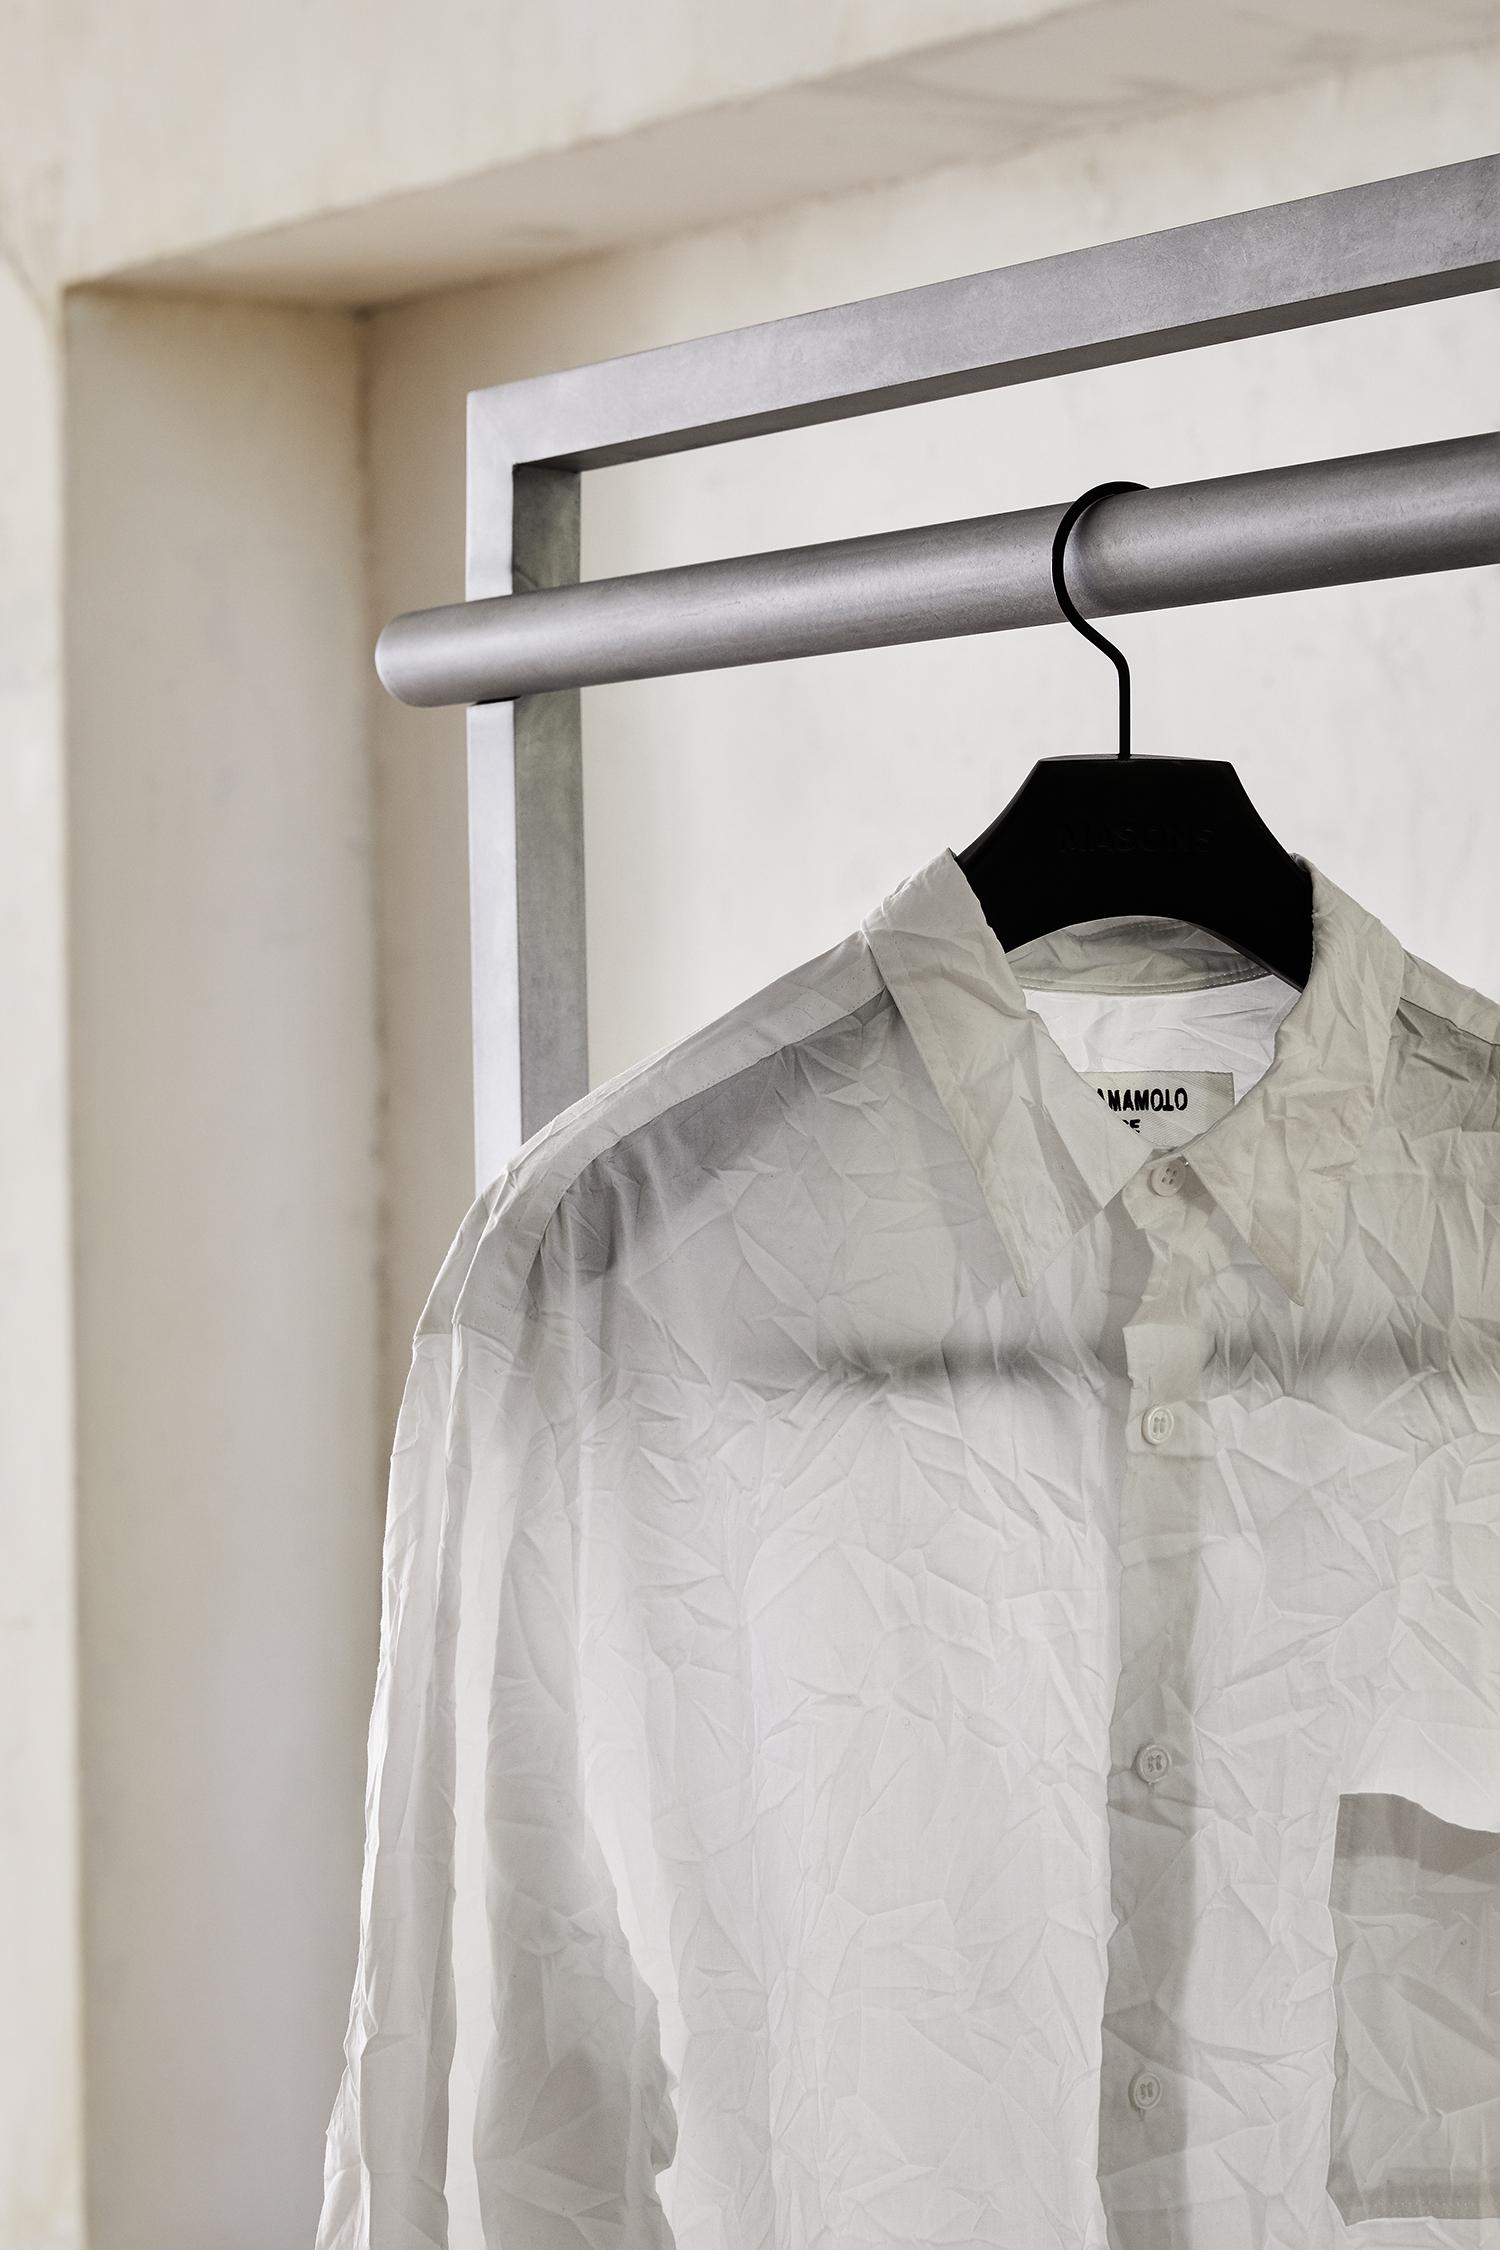 NO 3 Our Clothes Rack05